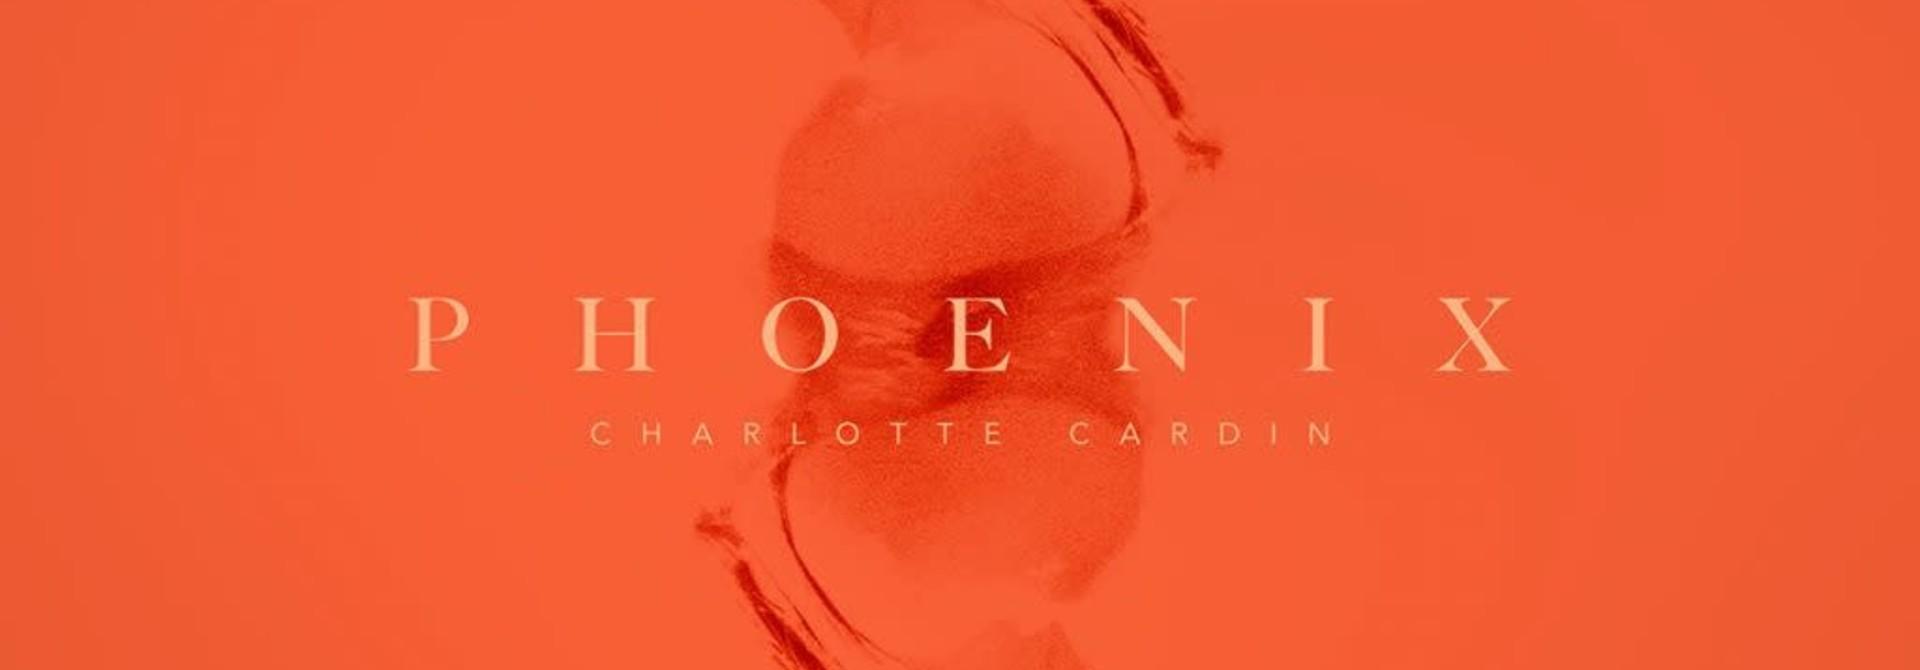 Charlotte Cardin • Phoenix